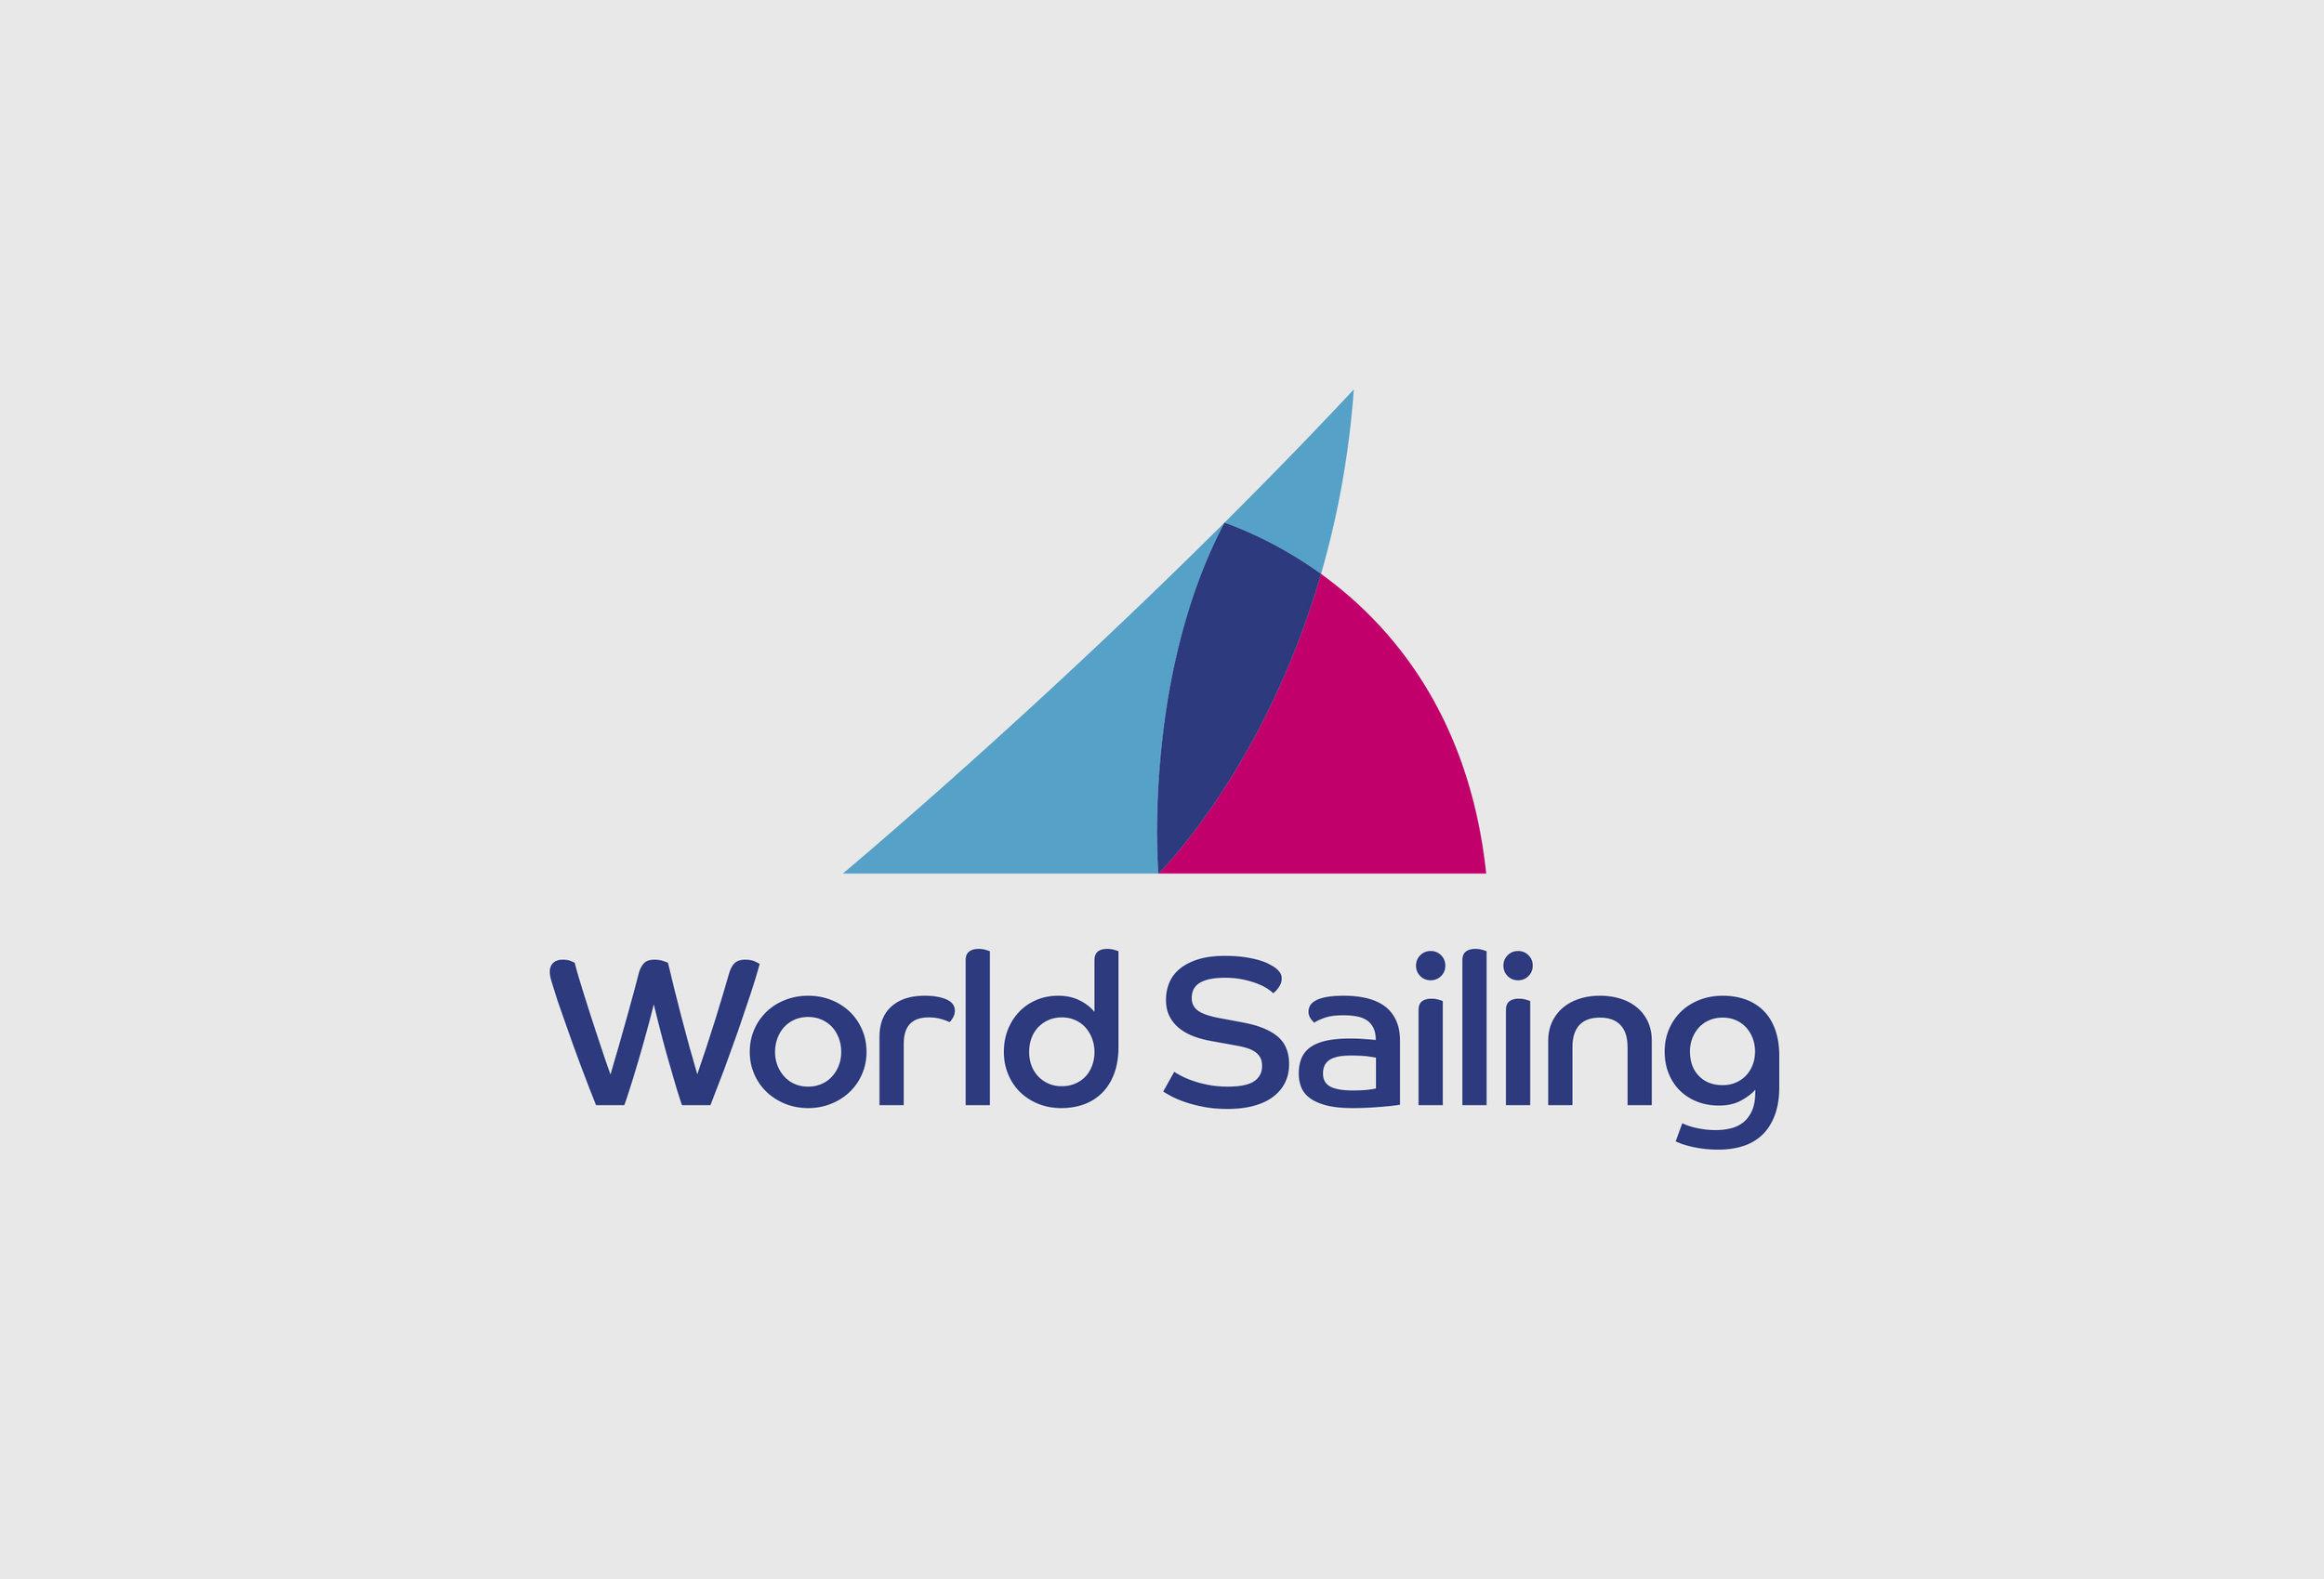 World Sailing 1 logo.jpg